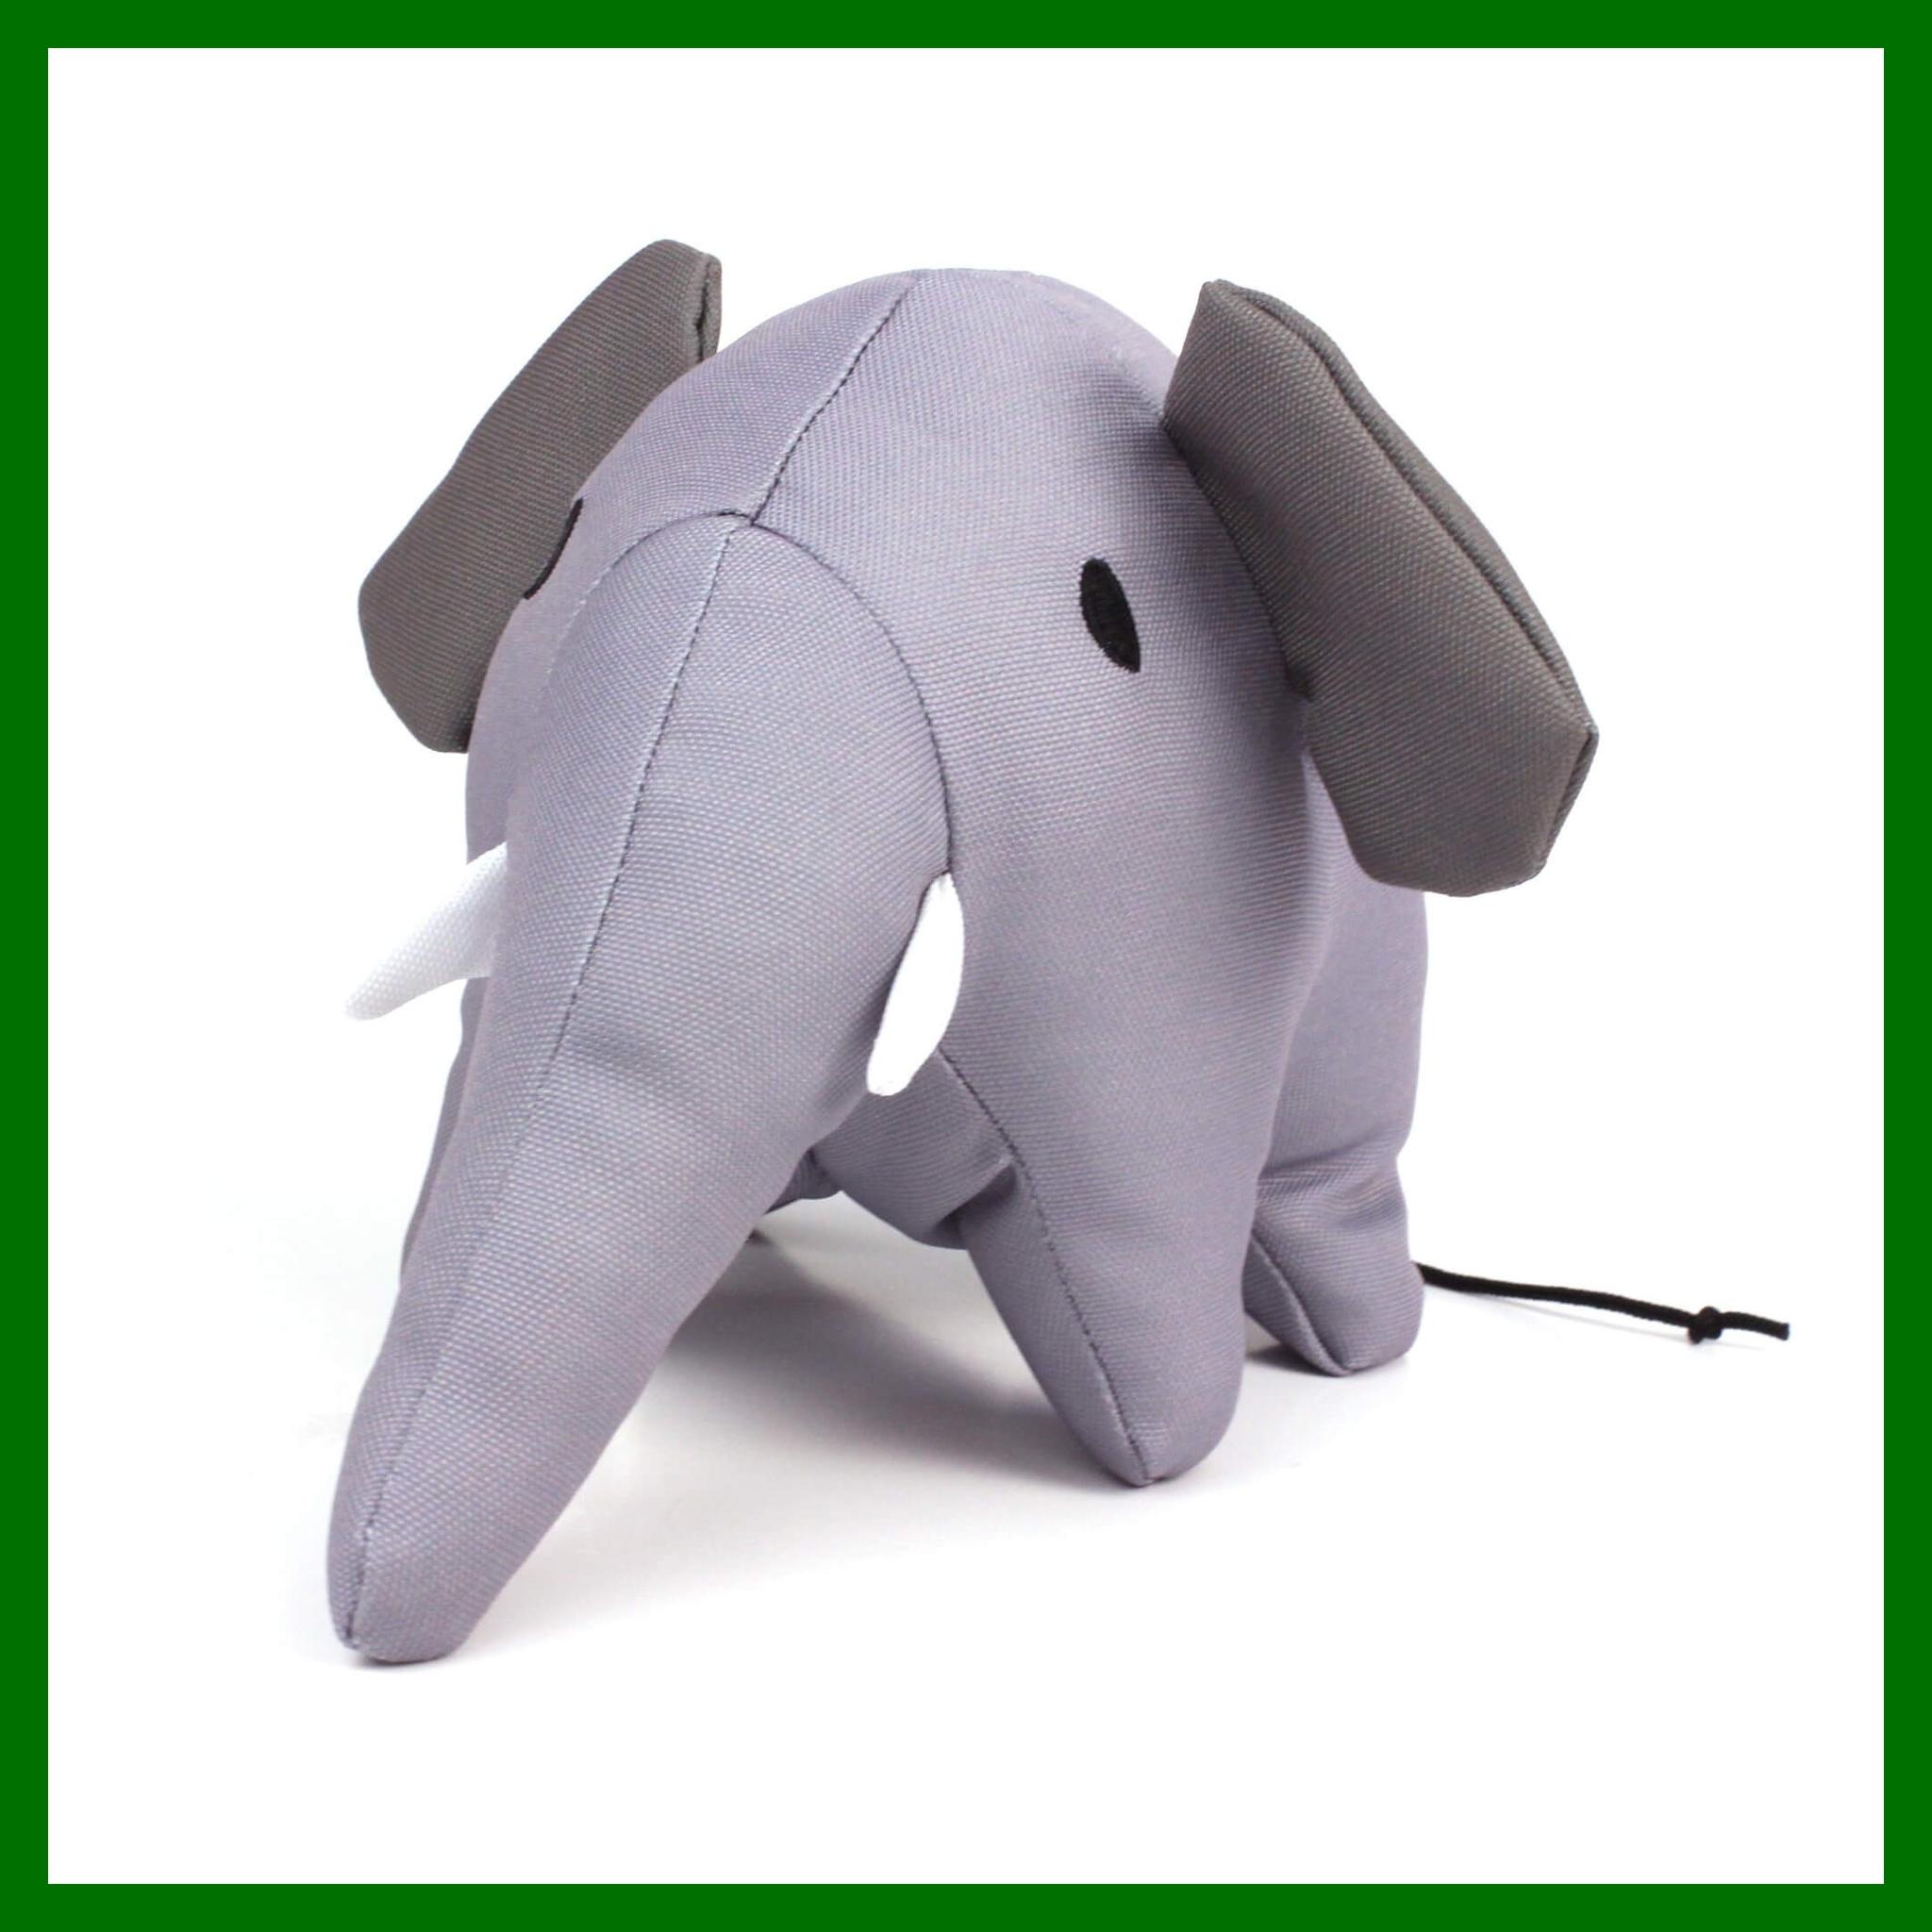 speelgoed hond estella de olifant speeltje